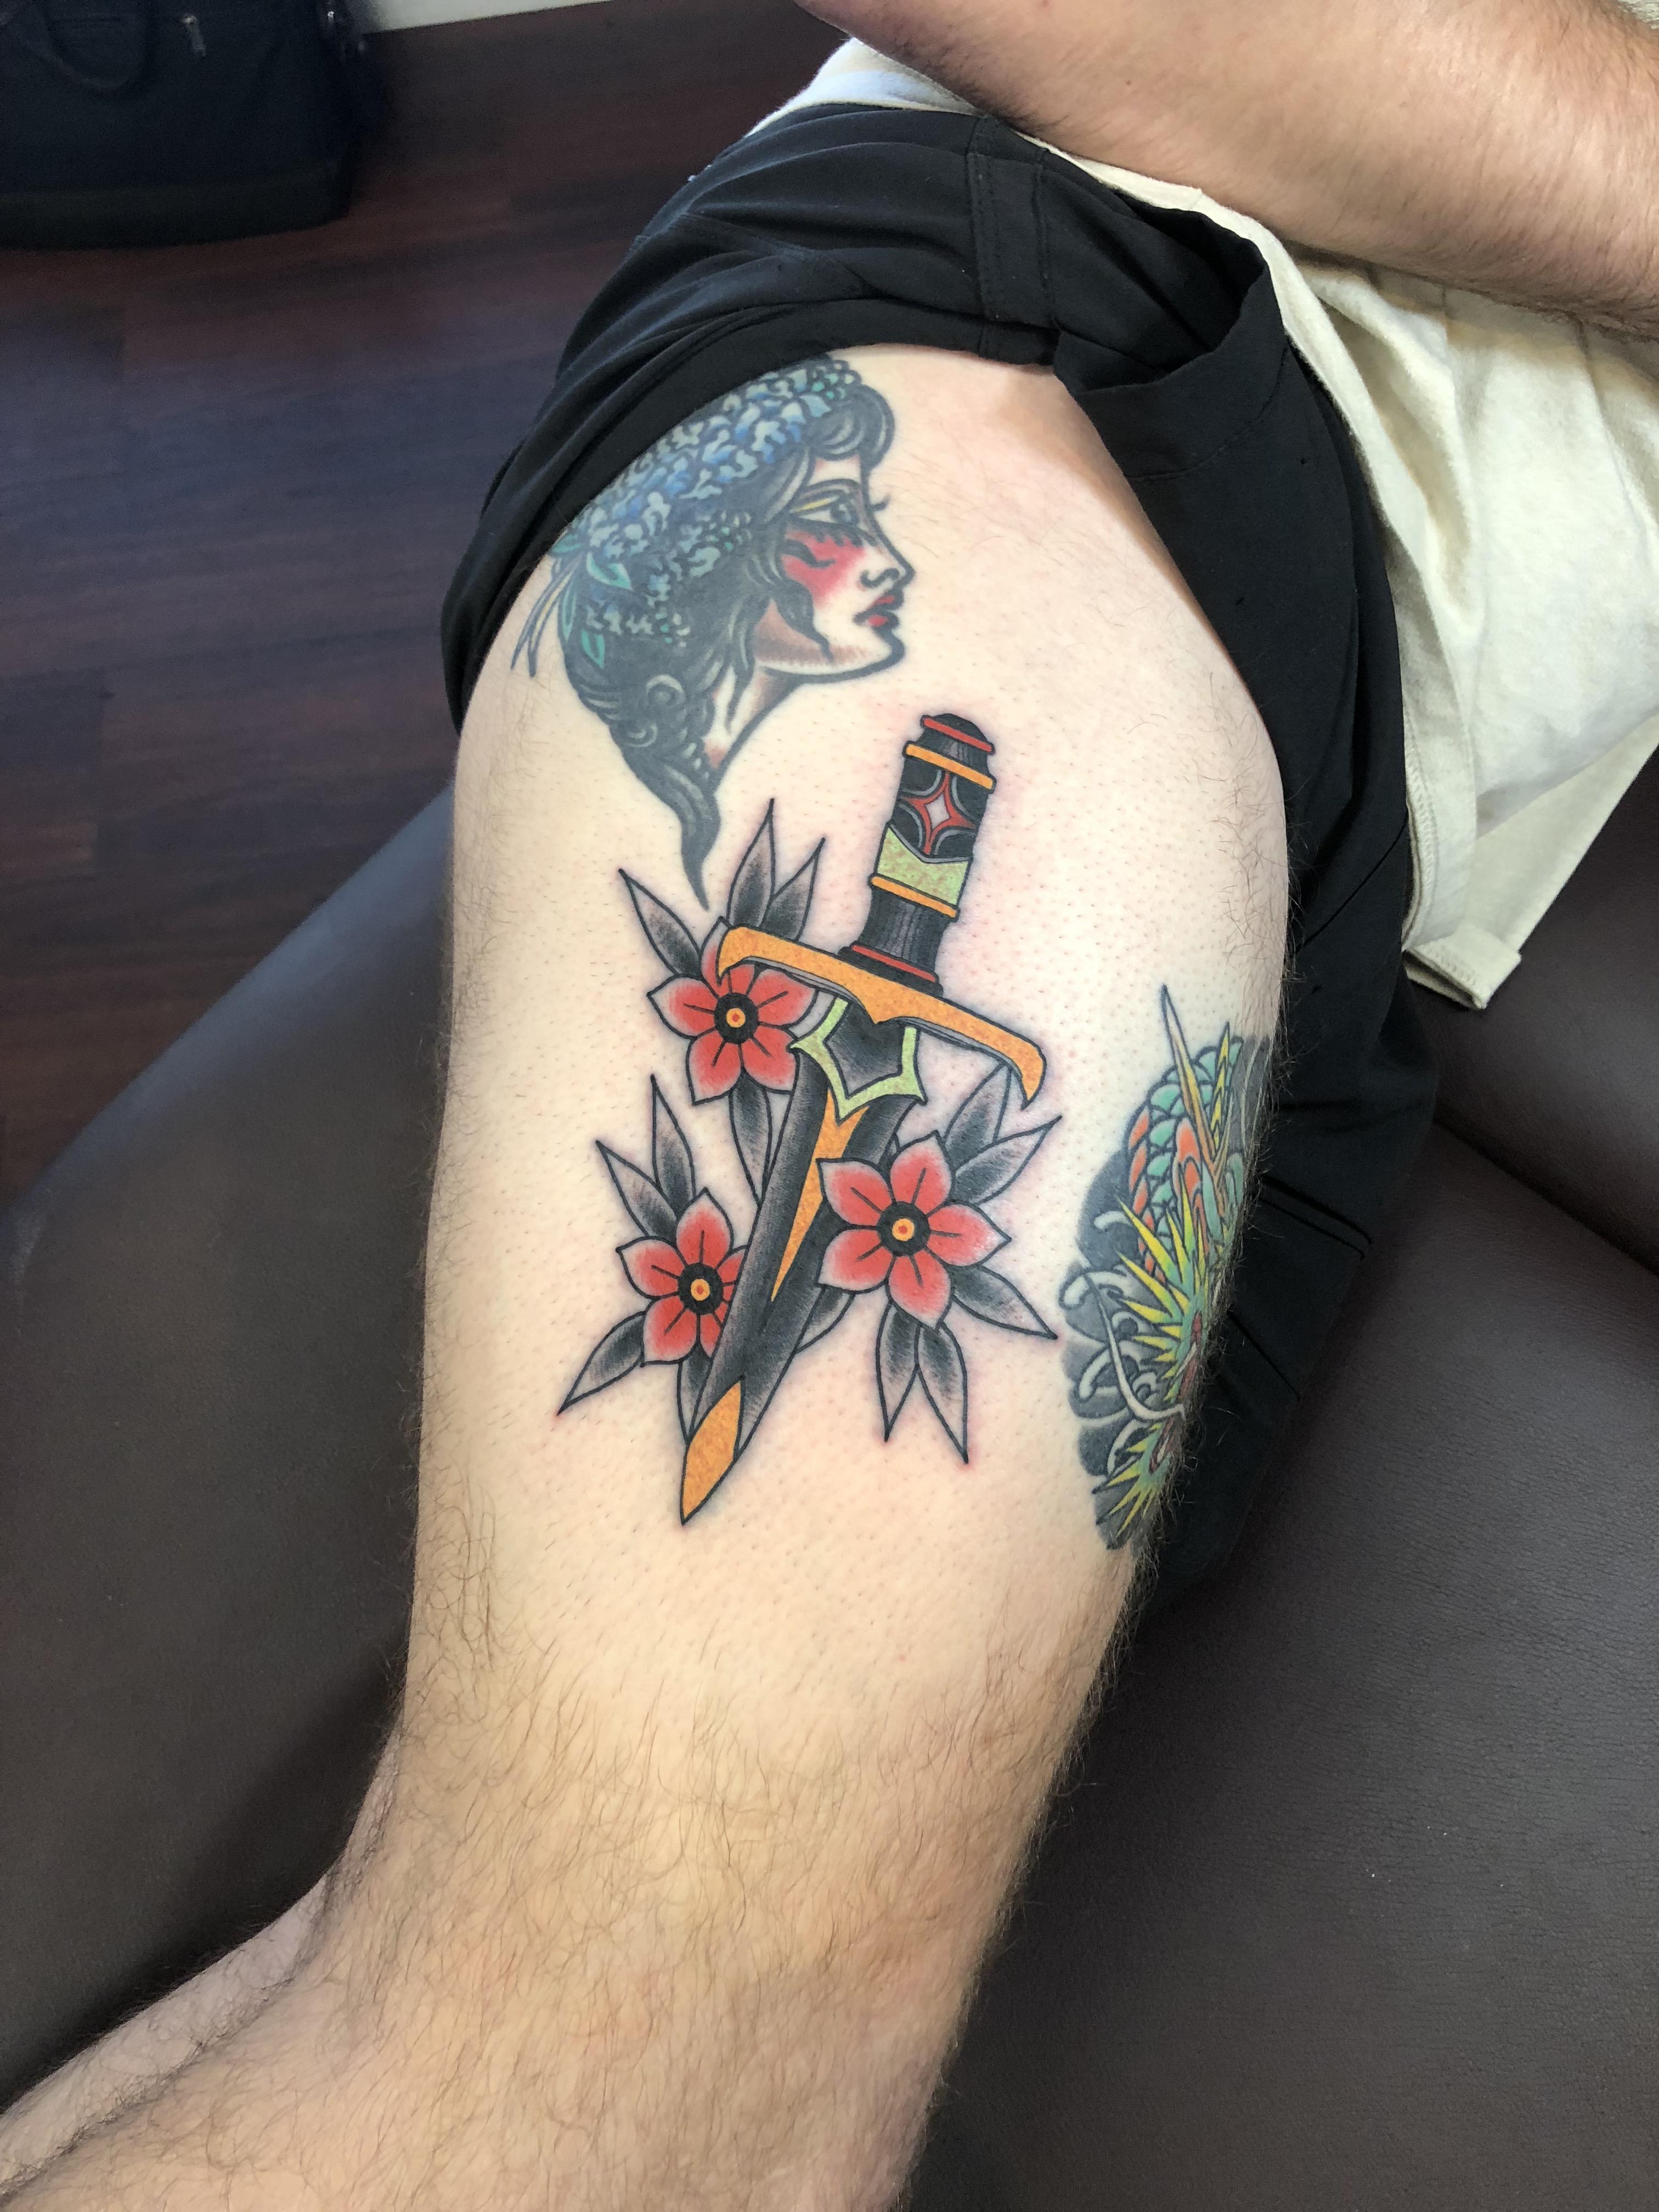 Red Dagger Tattoo : dagger, tattoo, Dagger, Mason, Chimato, Tattoo), Houston,, Tattoos